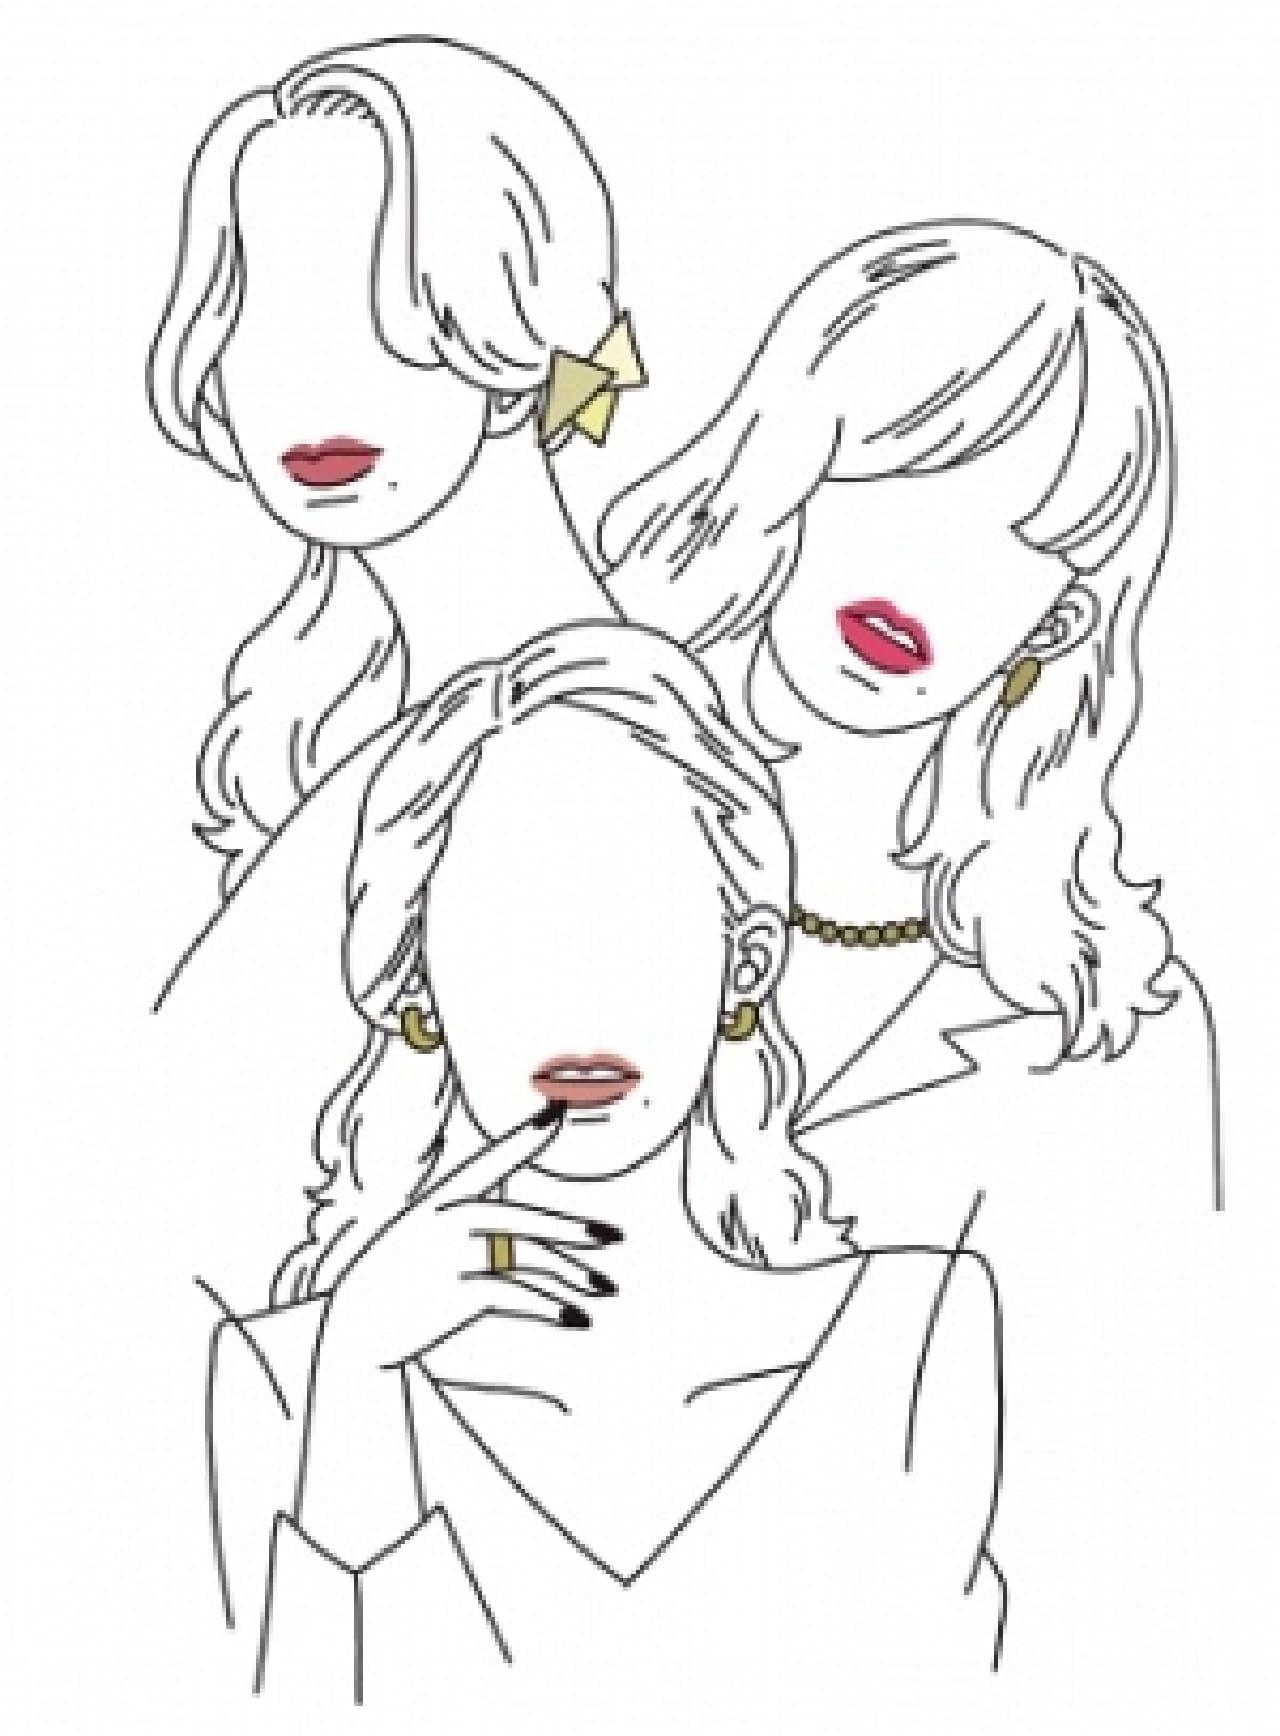 rms beautyの「ミニリップスティックセット」